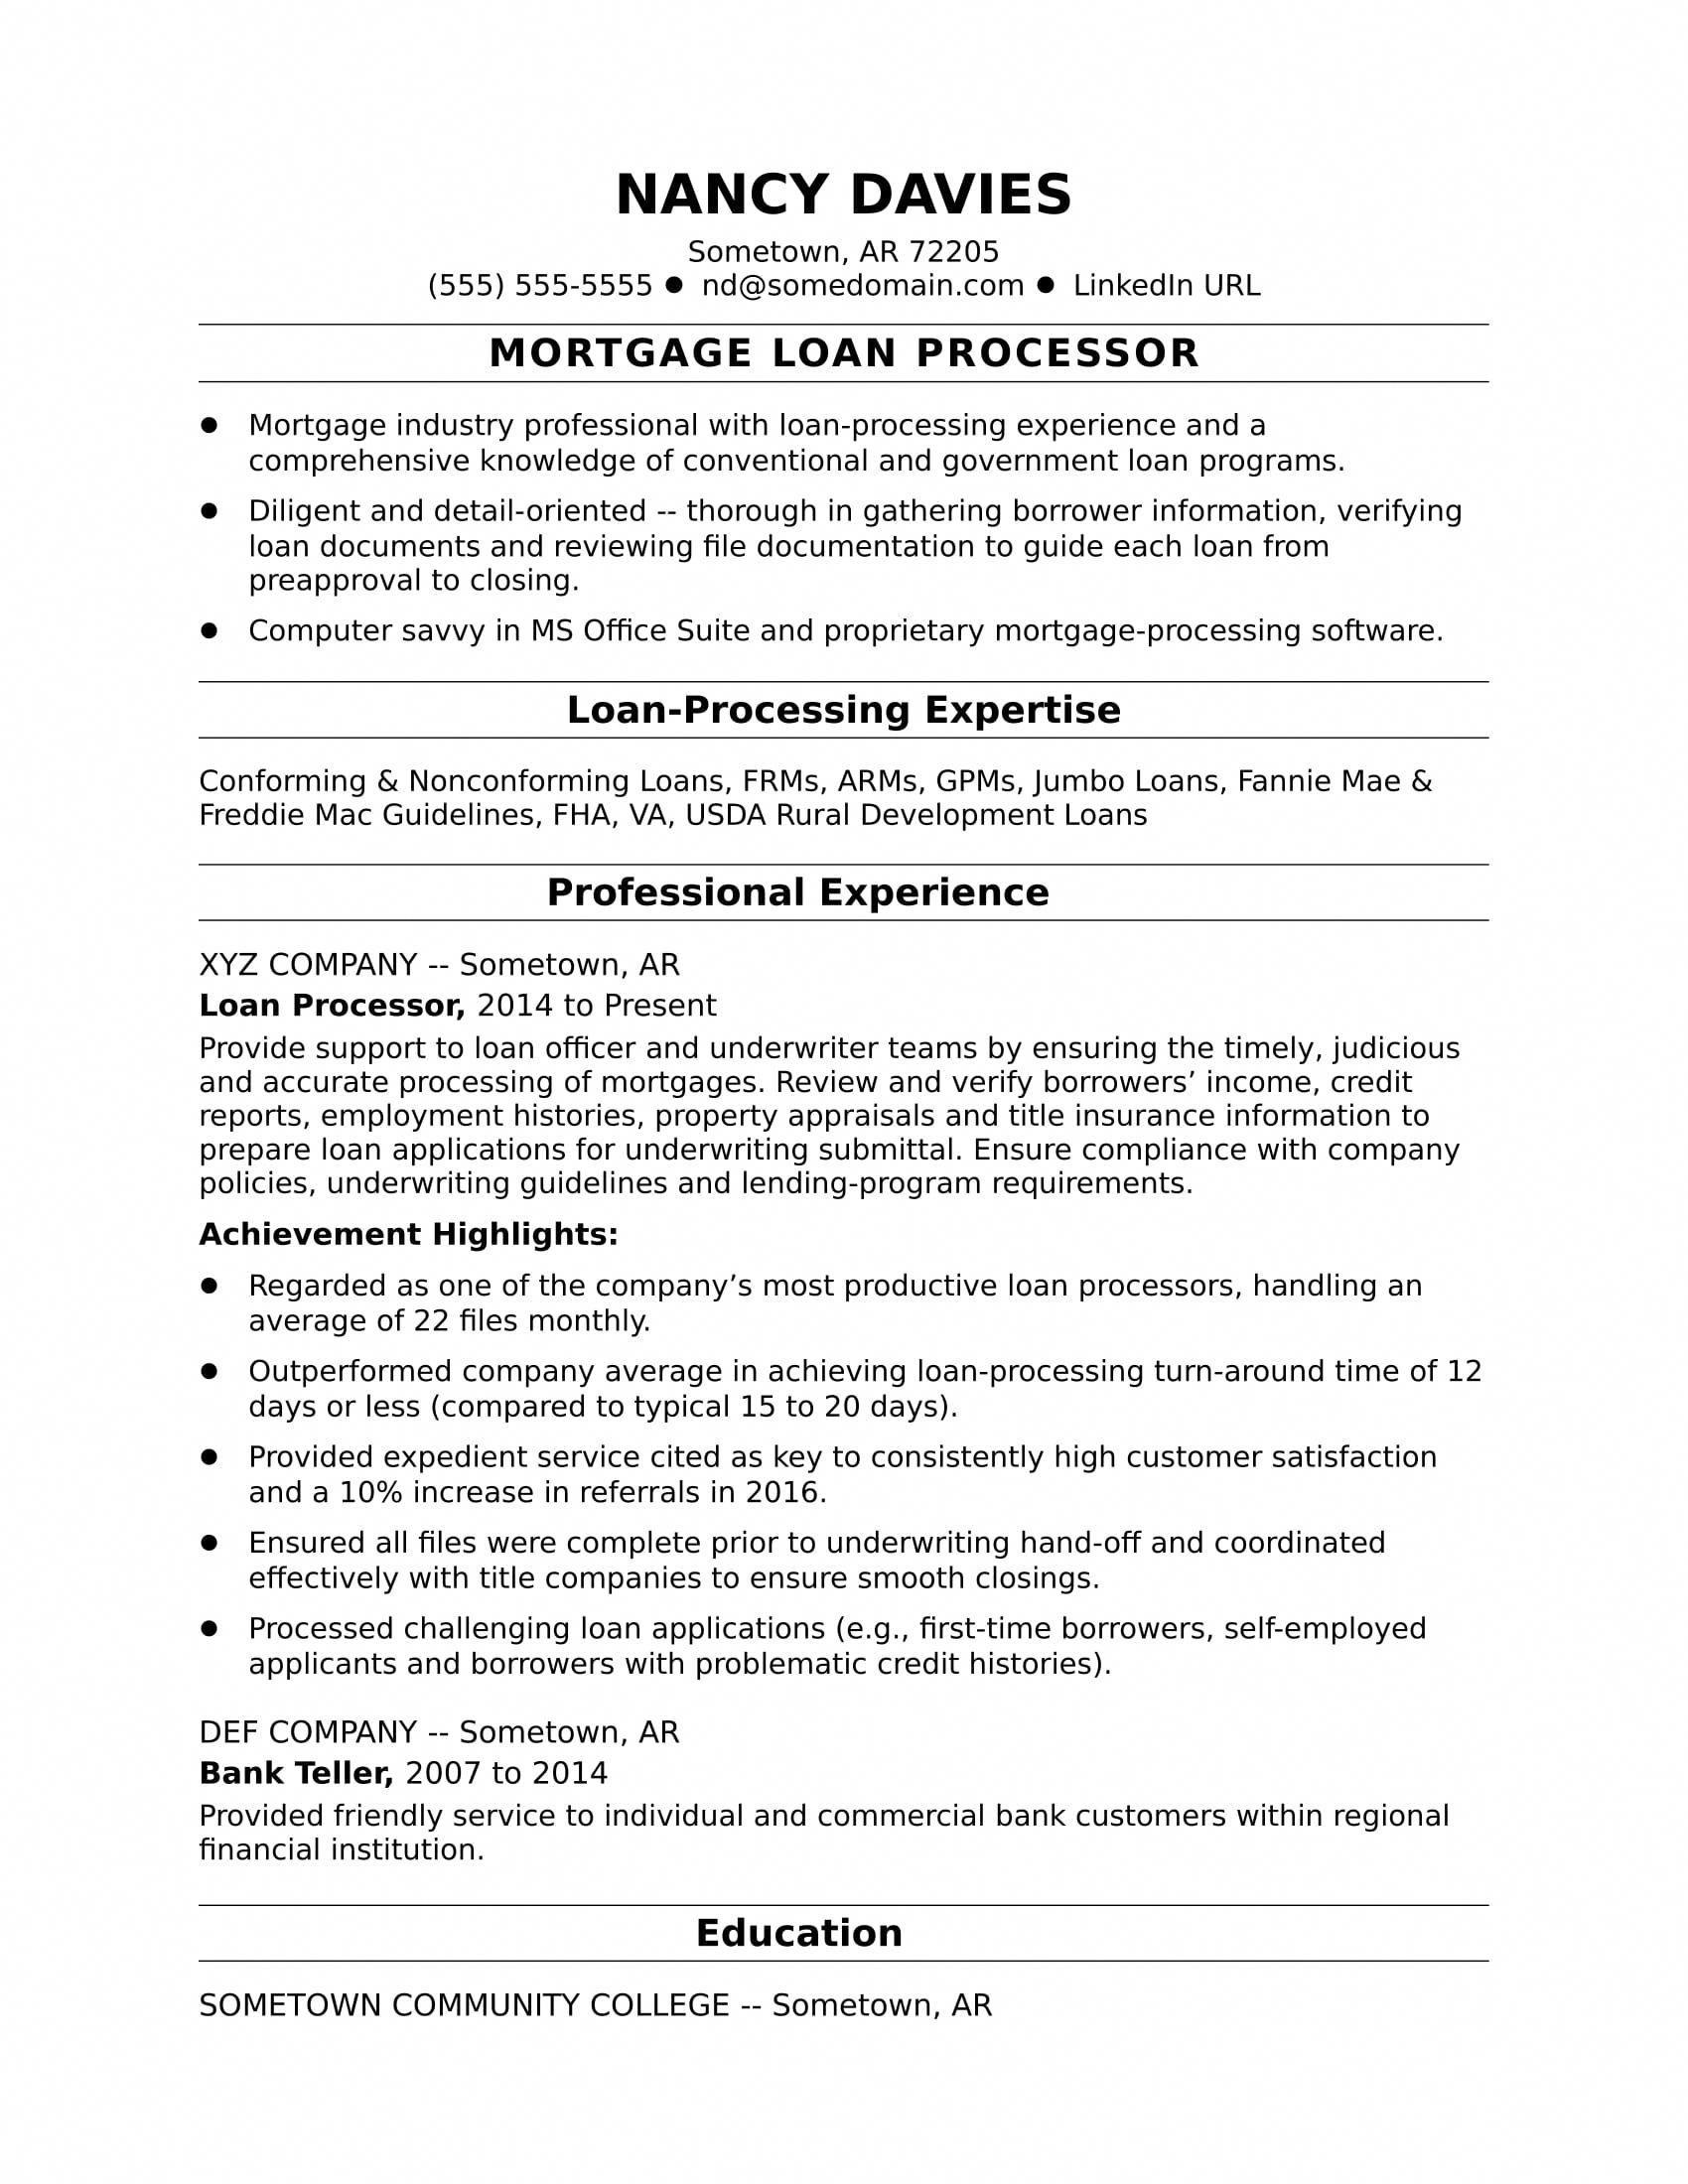 Sample Resume For A Mortgage Loan Processor Payoffmortgagein5years Mortgage Loan Officer Mortgage Loans Mortgage Processor